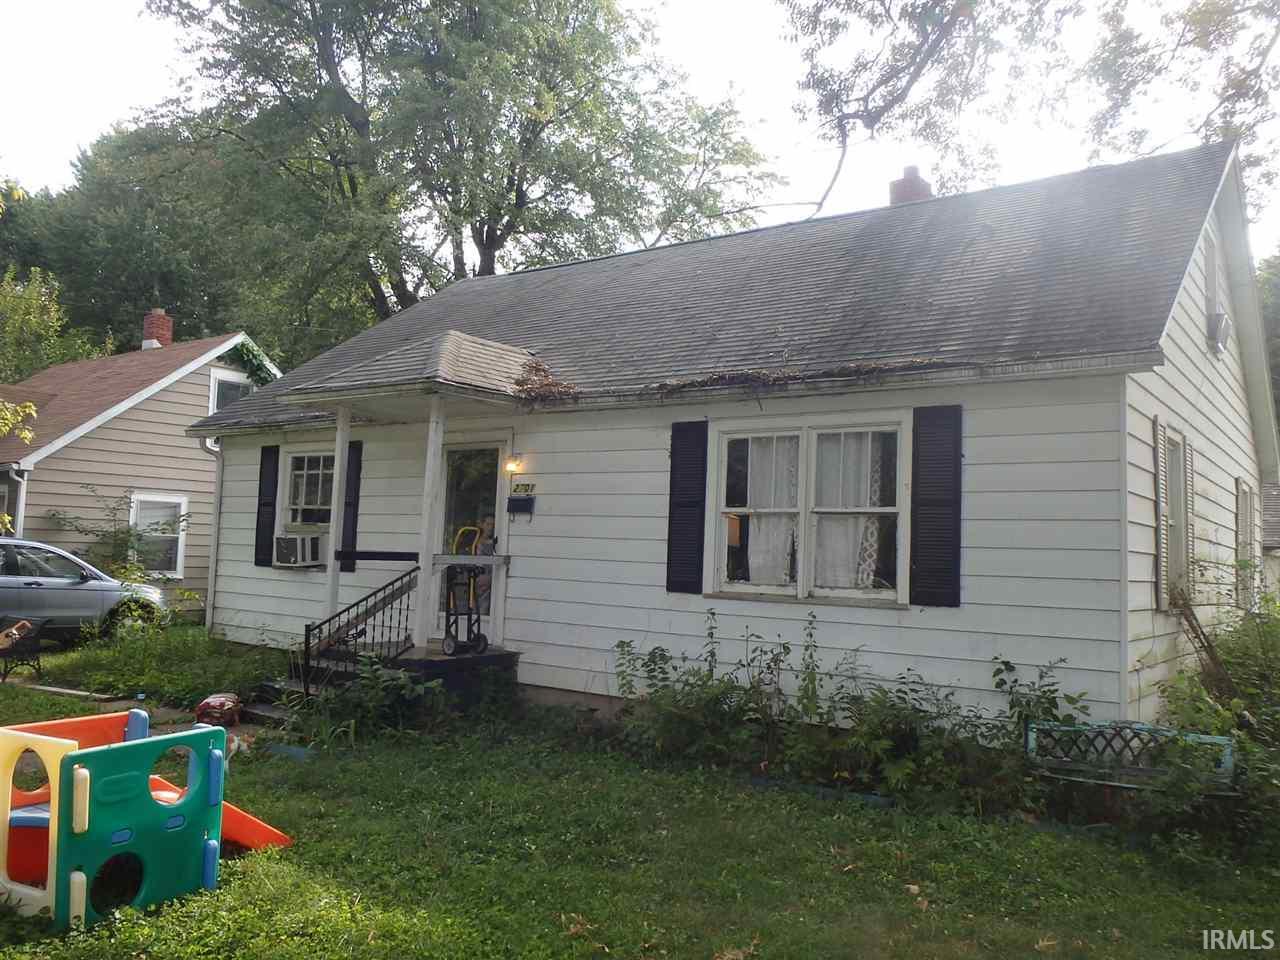 2701 S ALVORD, Evansville, IN 47714